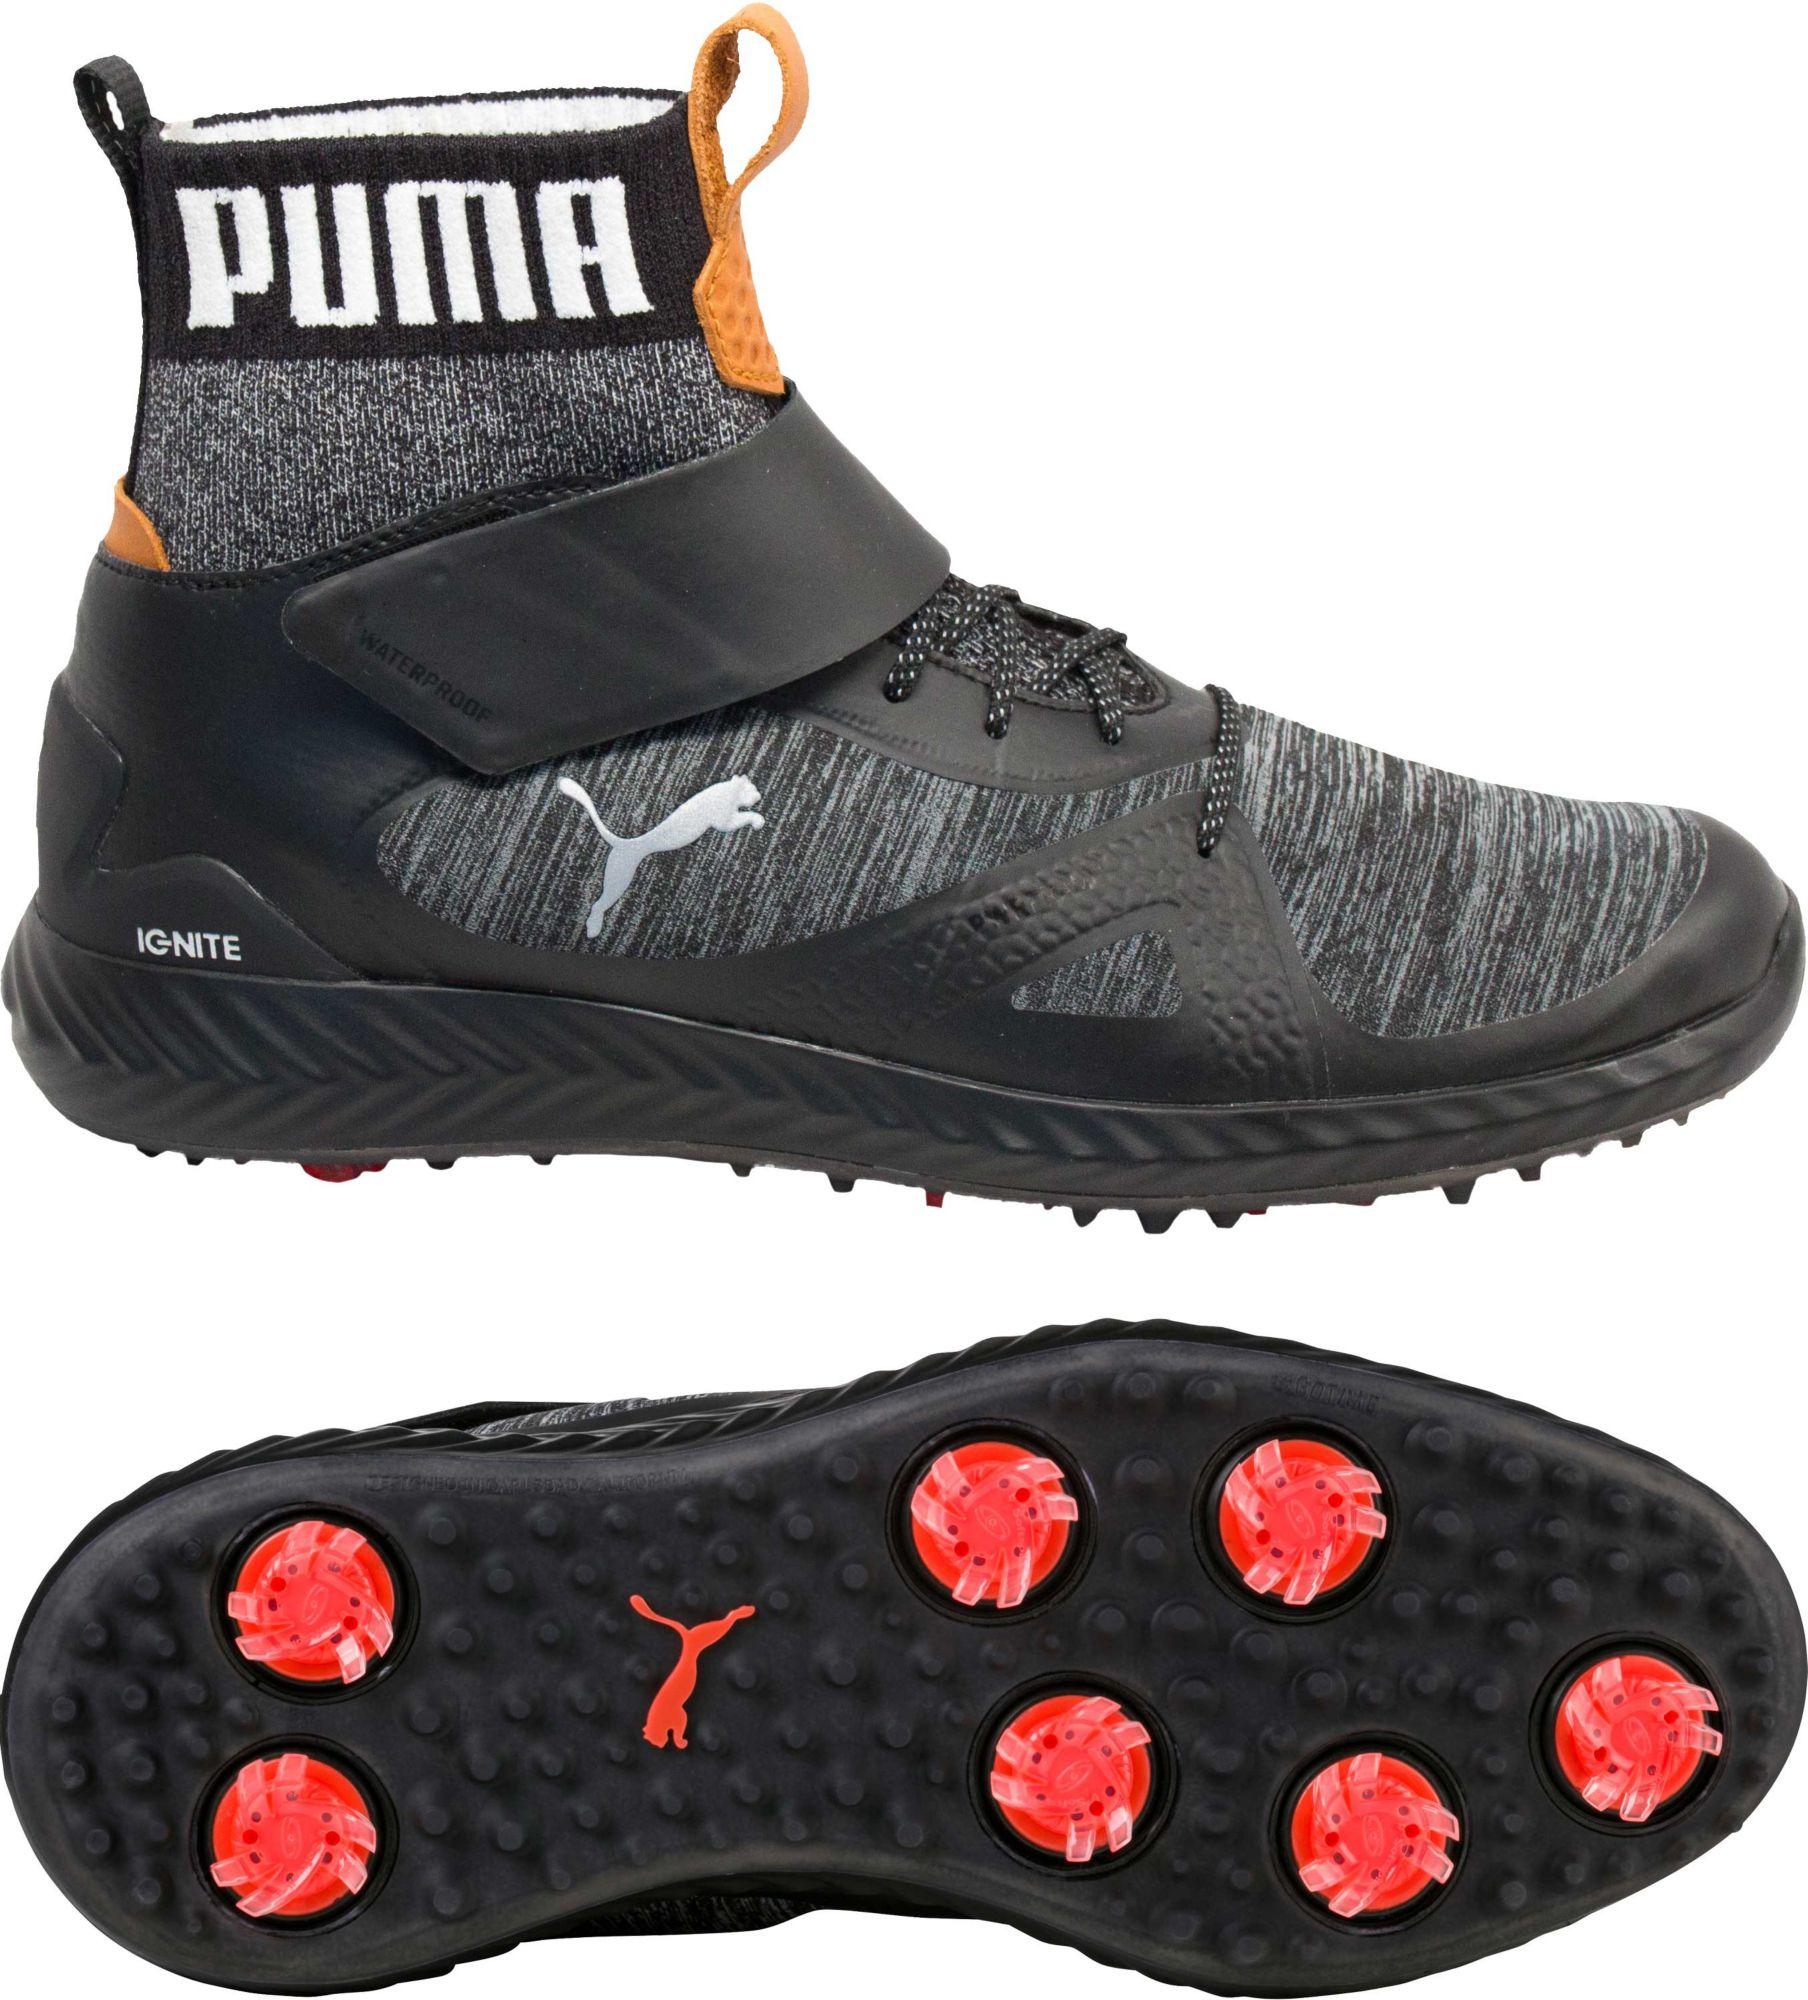 982f7161e4 Puma Ignite Pwradapt Hi-Top Golf Shoes, Men's in 2019 | Products ...